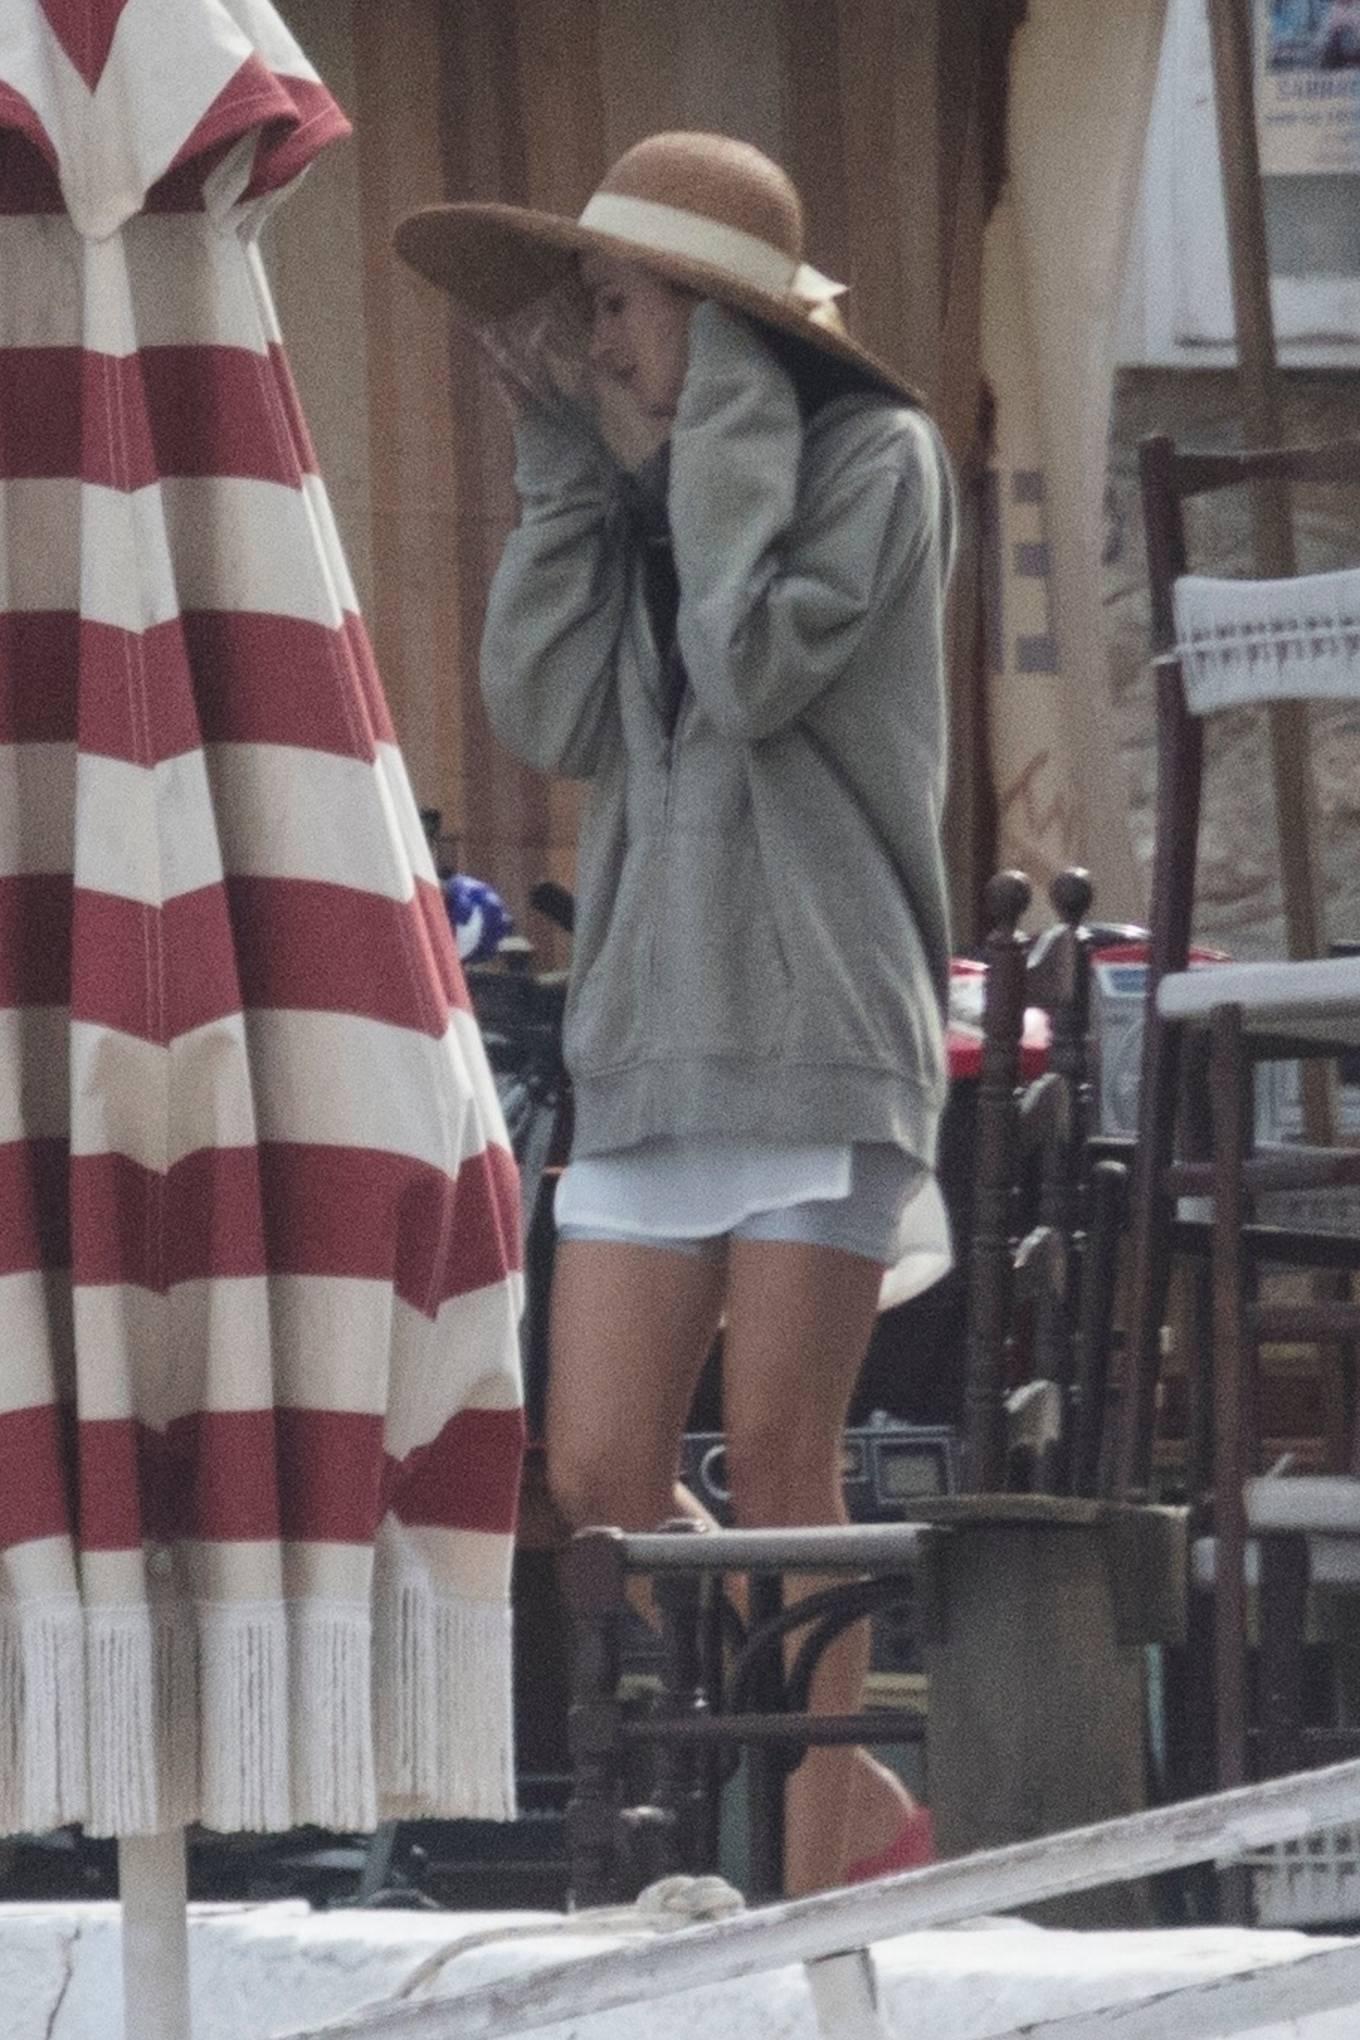 Dakota Johnson 2020 : Dakota Johnson – Filming The Lost Daughter in Speteses Island-10